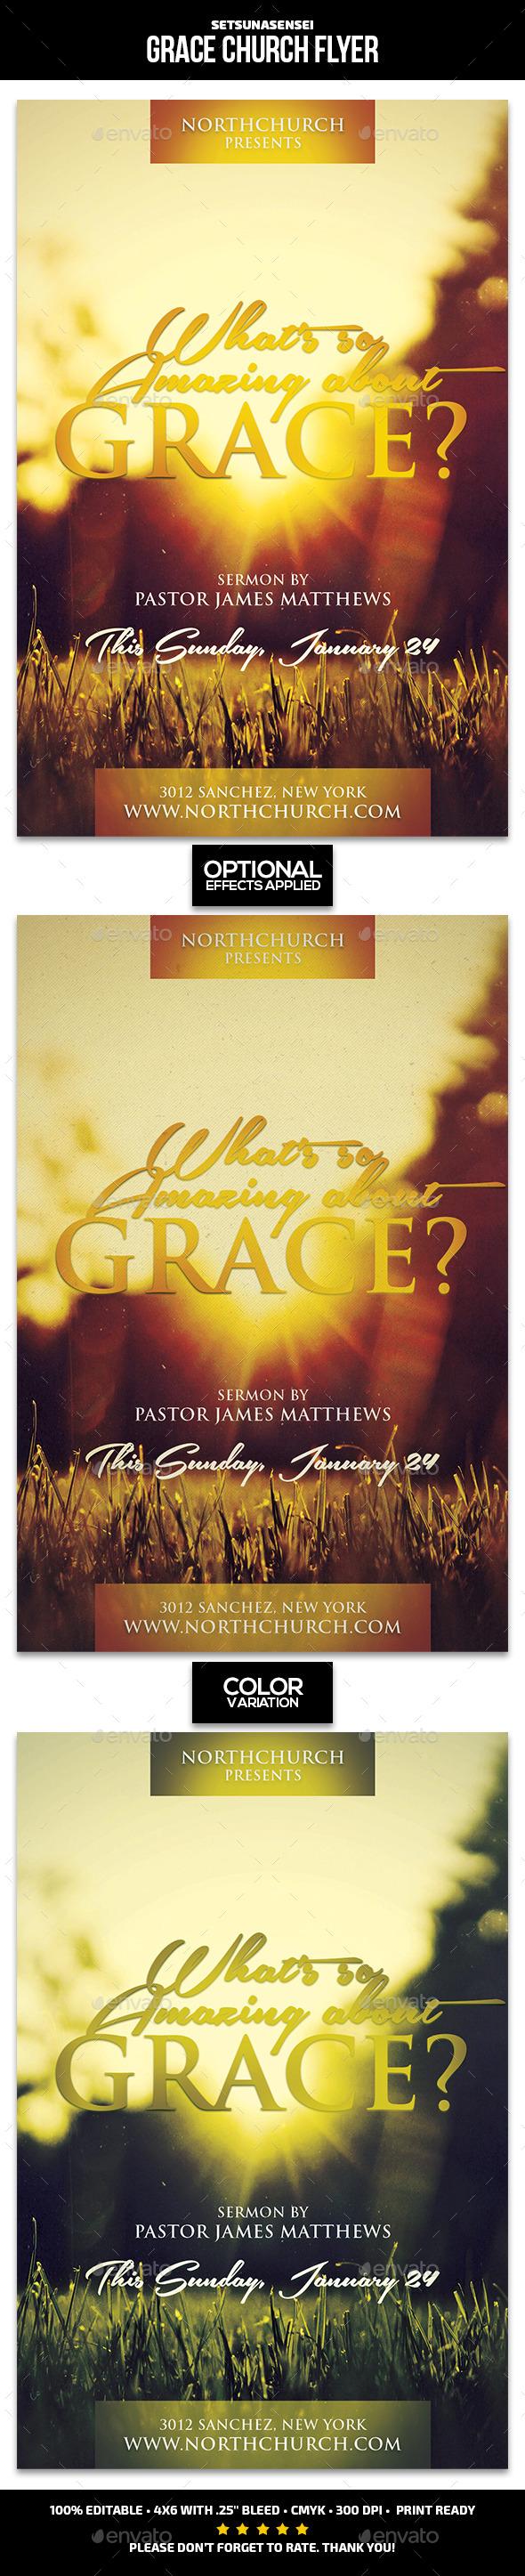 Grace Church Flyer - Church Flyers